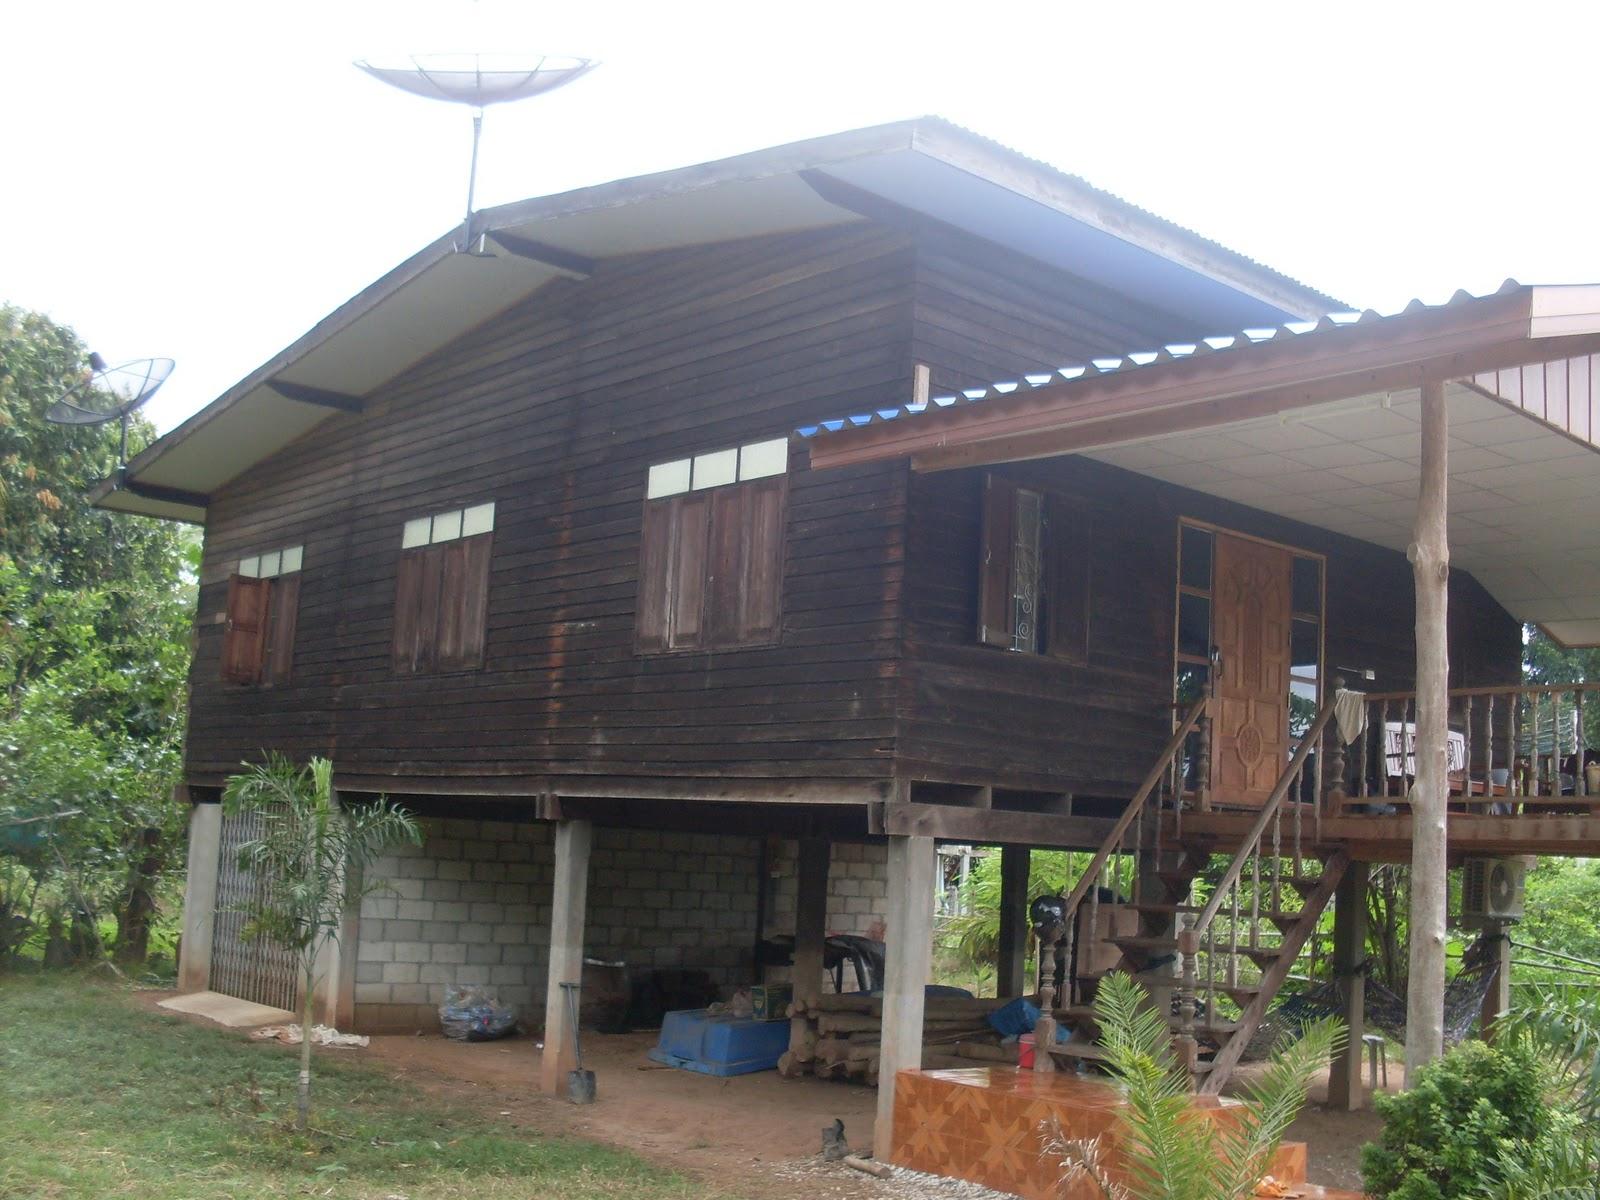 bauweise der h user mein leben in nordwest thailand. Black Bedroom Furniture Sets. Home Design Ideas